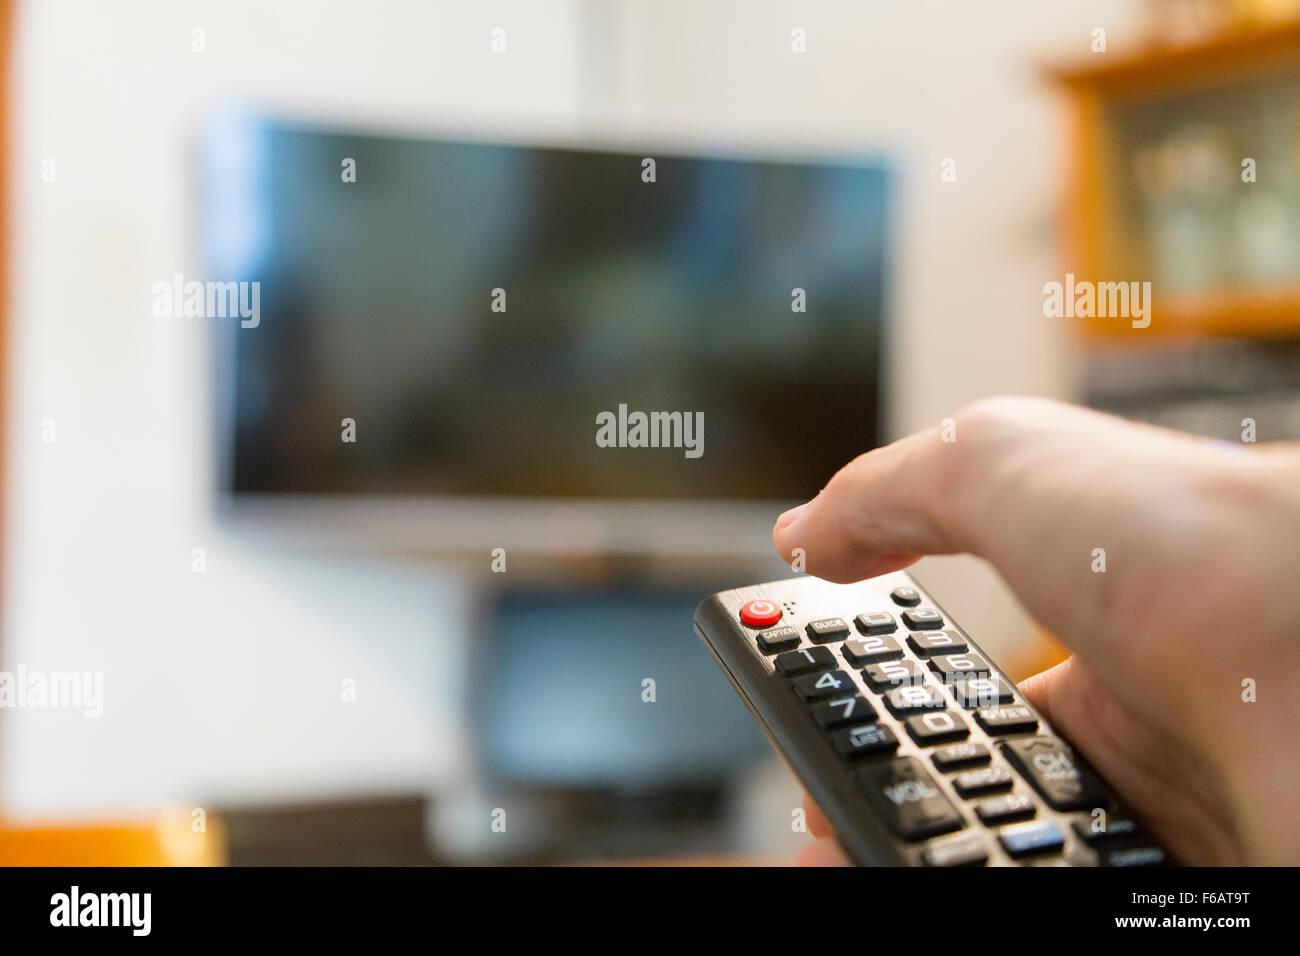 Lg Smart Tv Remote Stock Photos & Lg Smart Tv Remote Stock